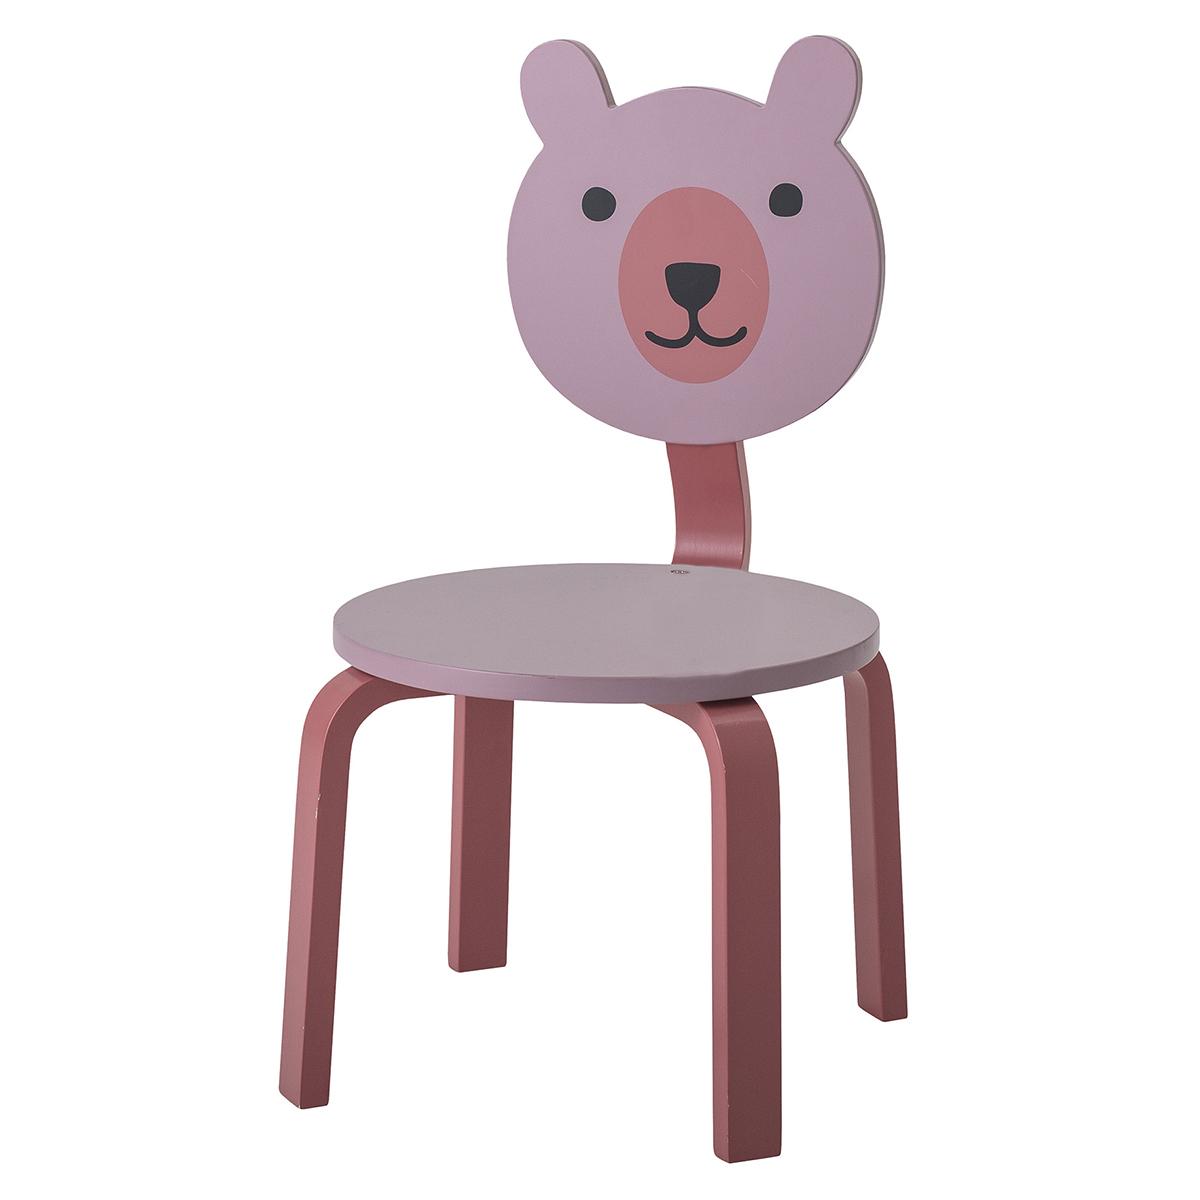 Table & Chaise Chaise Ours - Rose Chaise Ours - Rose